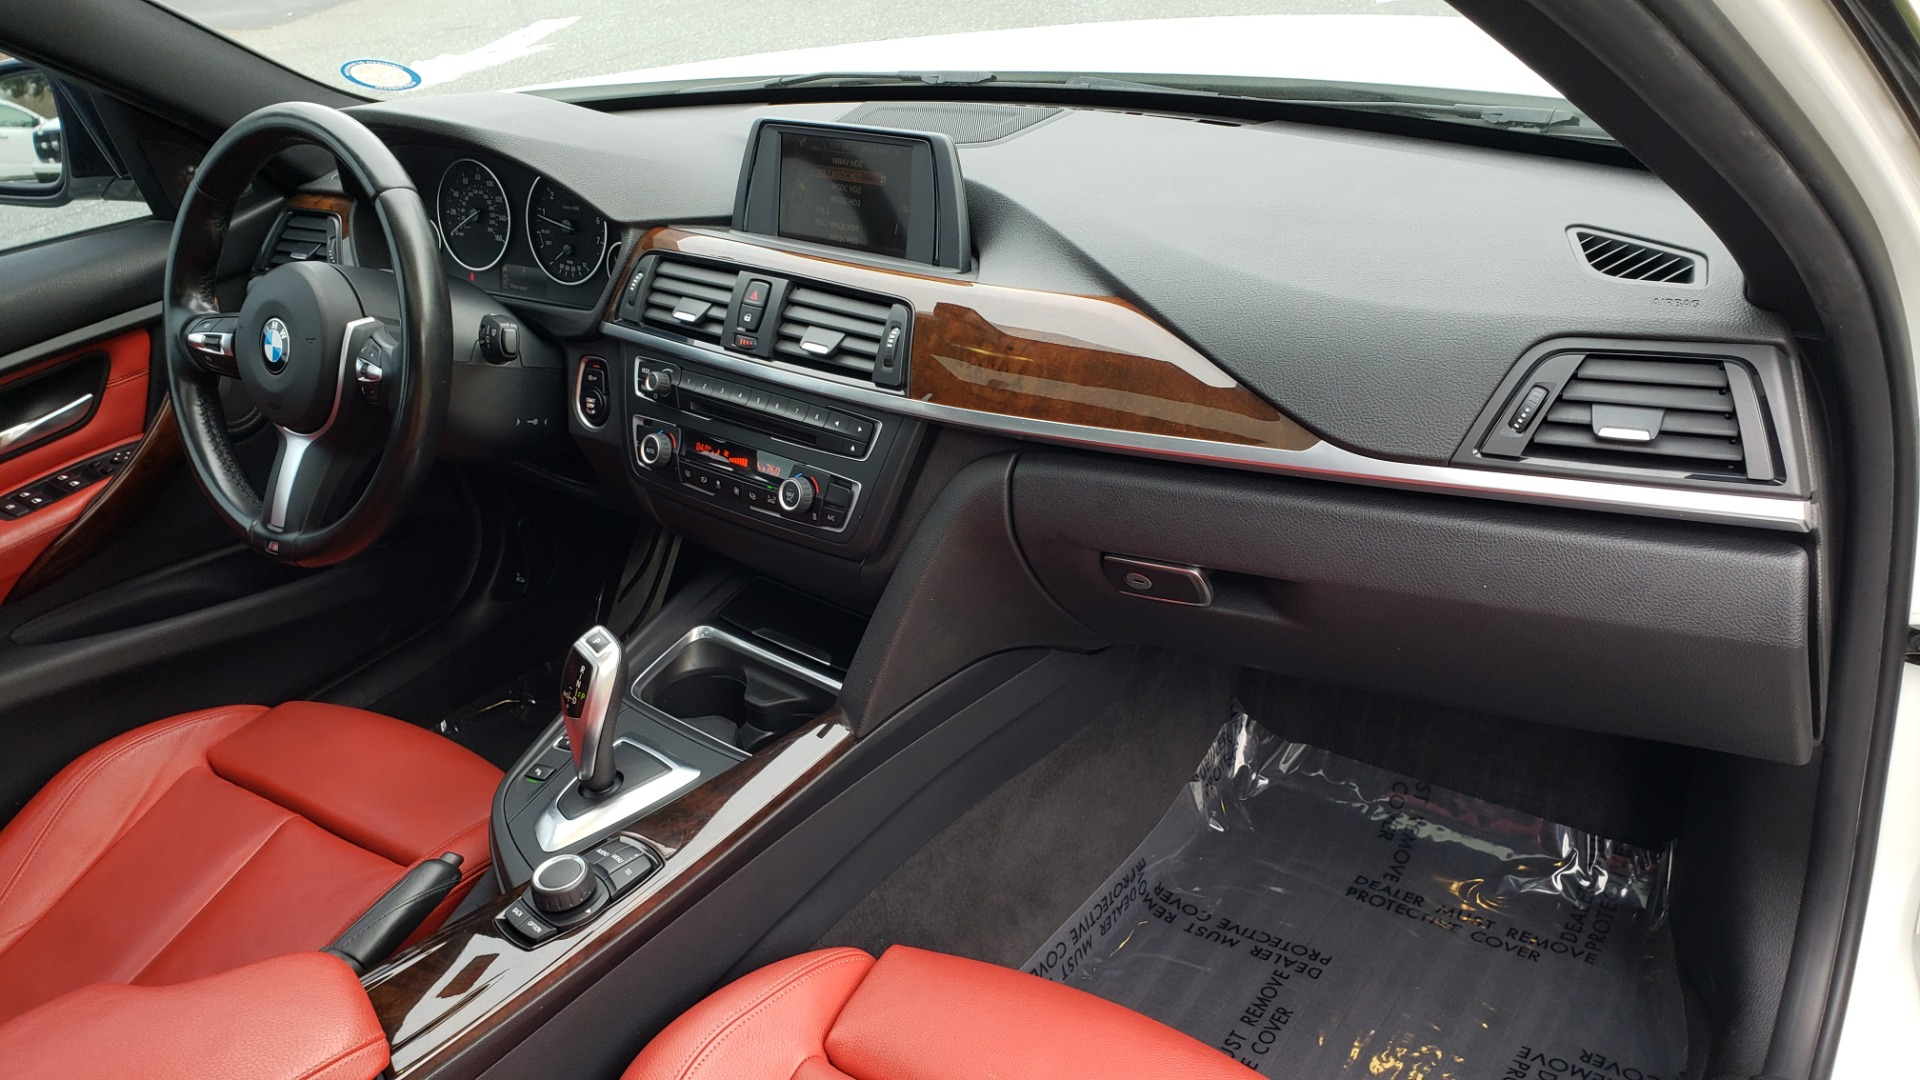 Used 2015 BMW 3 Series 335I M-SPORT / PREM PKG / HK SND / SUNROOF / REARVIEW for sale Sold at Formula Imports in Charlotte NC 28227 68